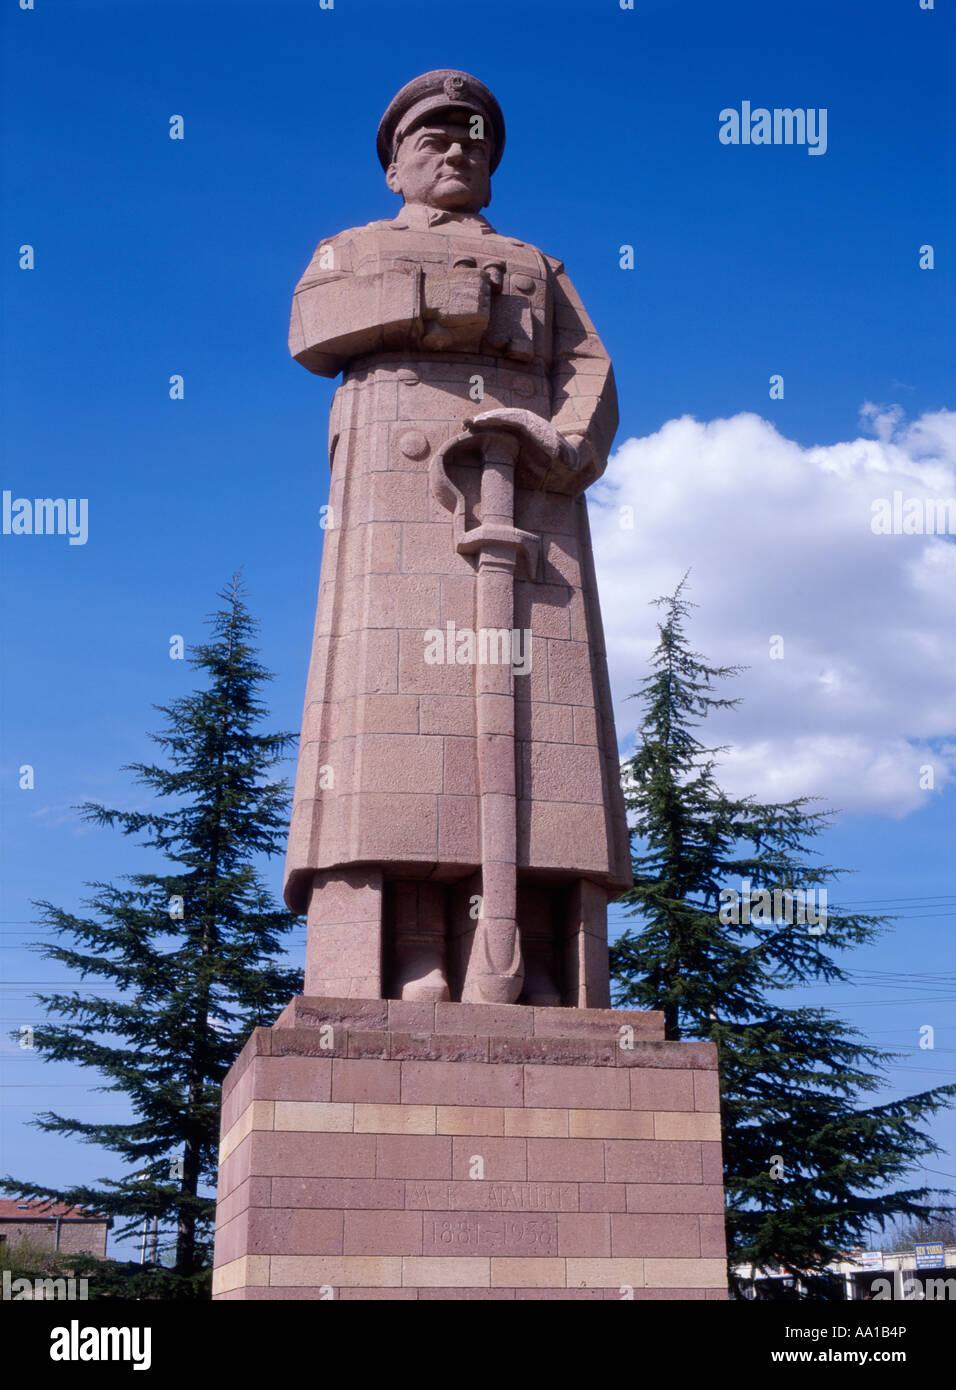 Statue of Mustafa Kemal Atatürk, Derinkuyu, Turkey first president of the Turkish republic. Stock Photo